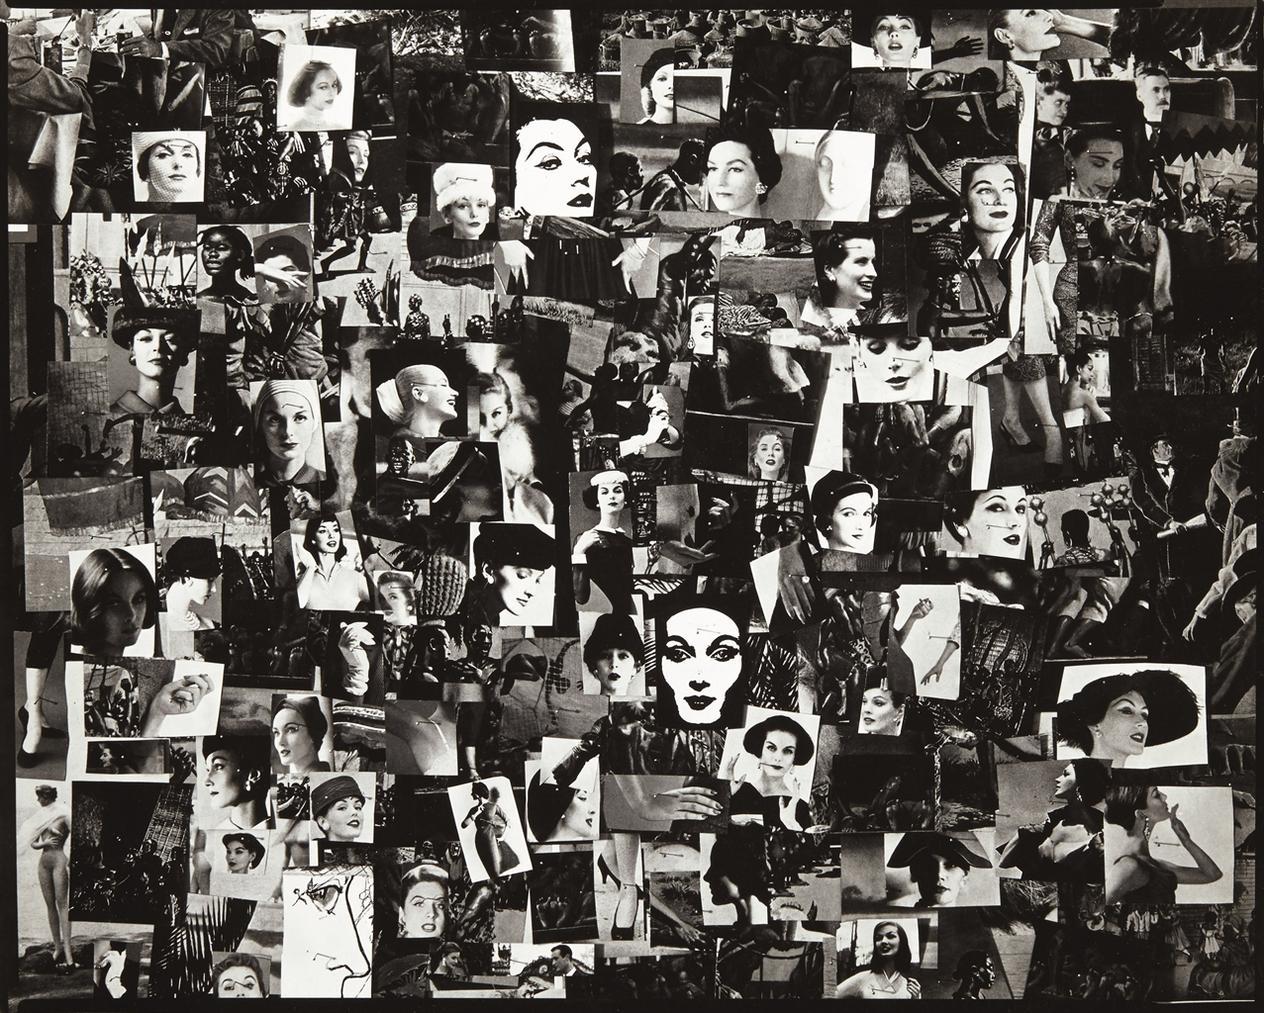 Harry Callahan-Collage, c. 1956-1956